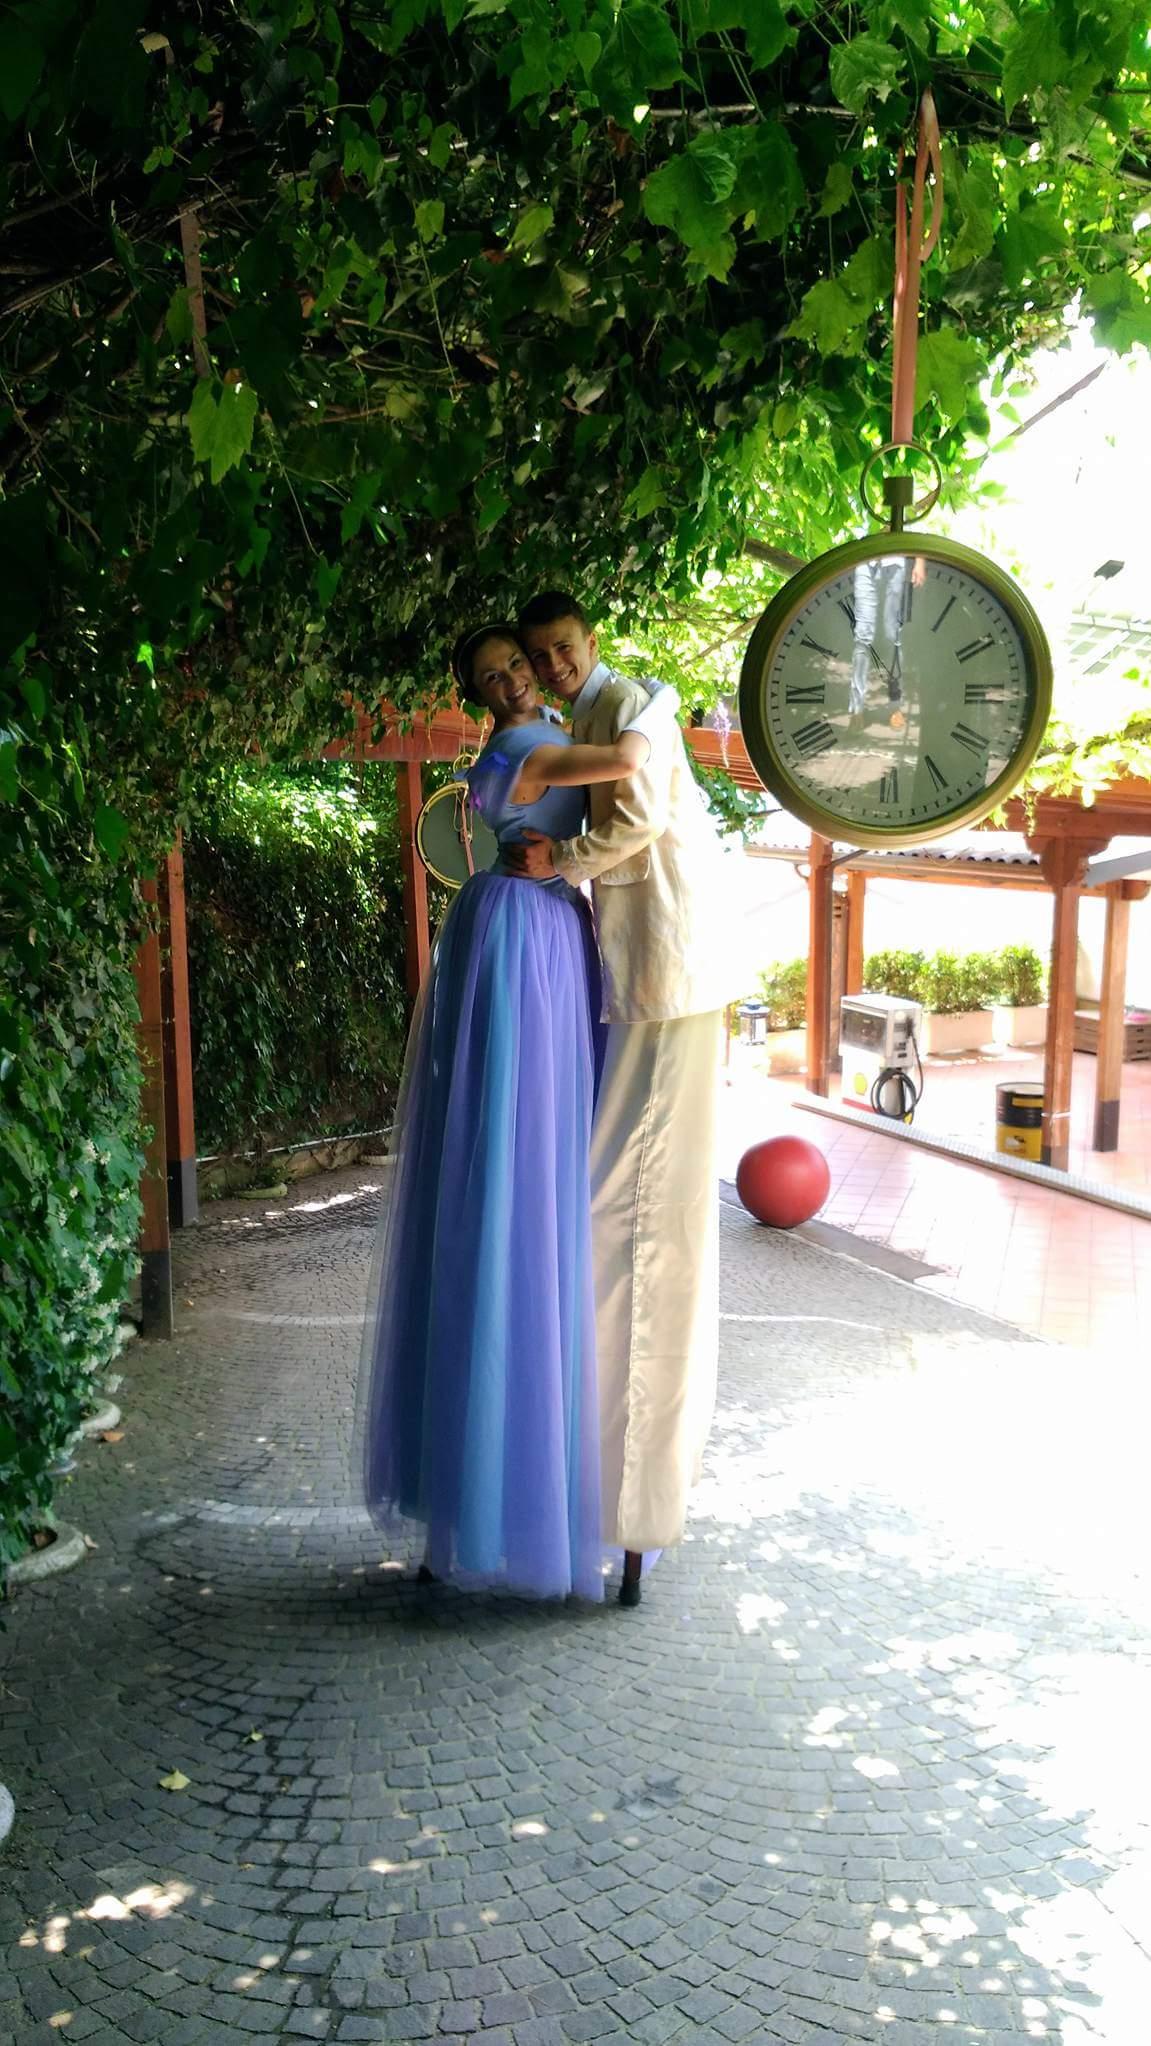 trampolieri_principessa_principe_3